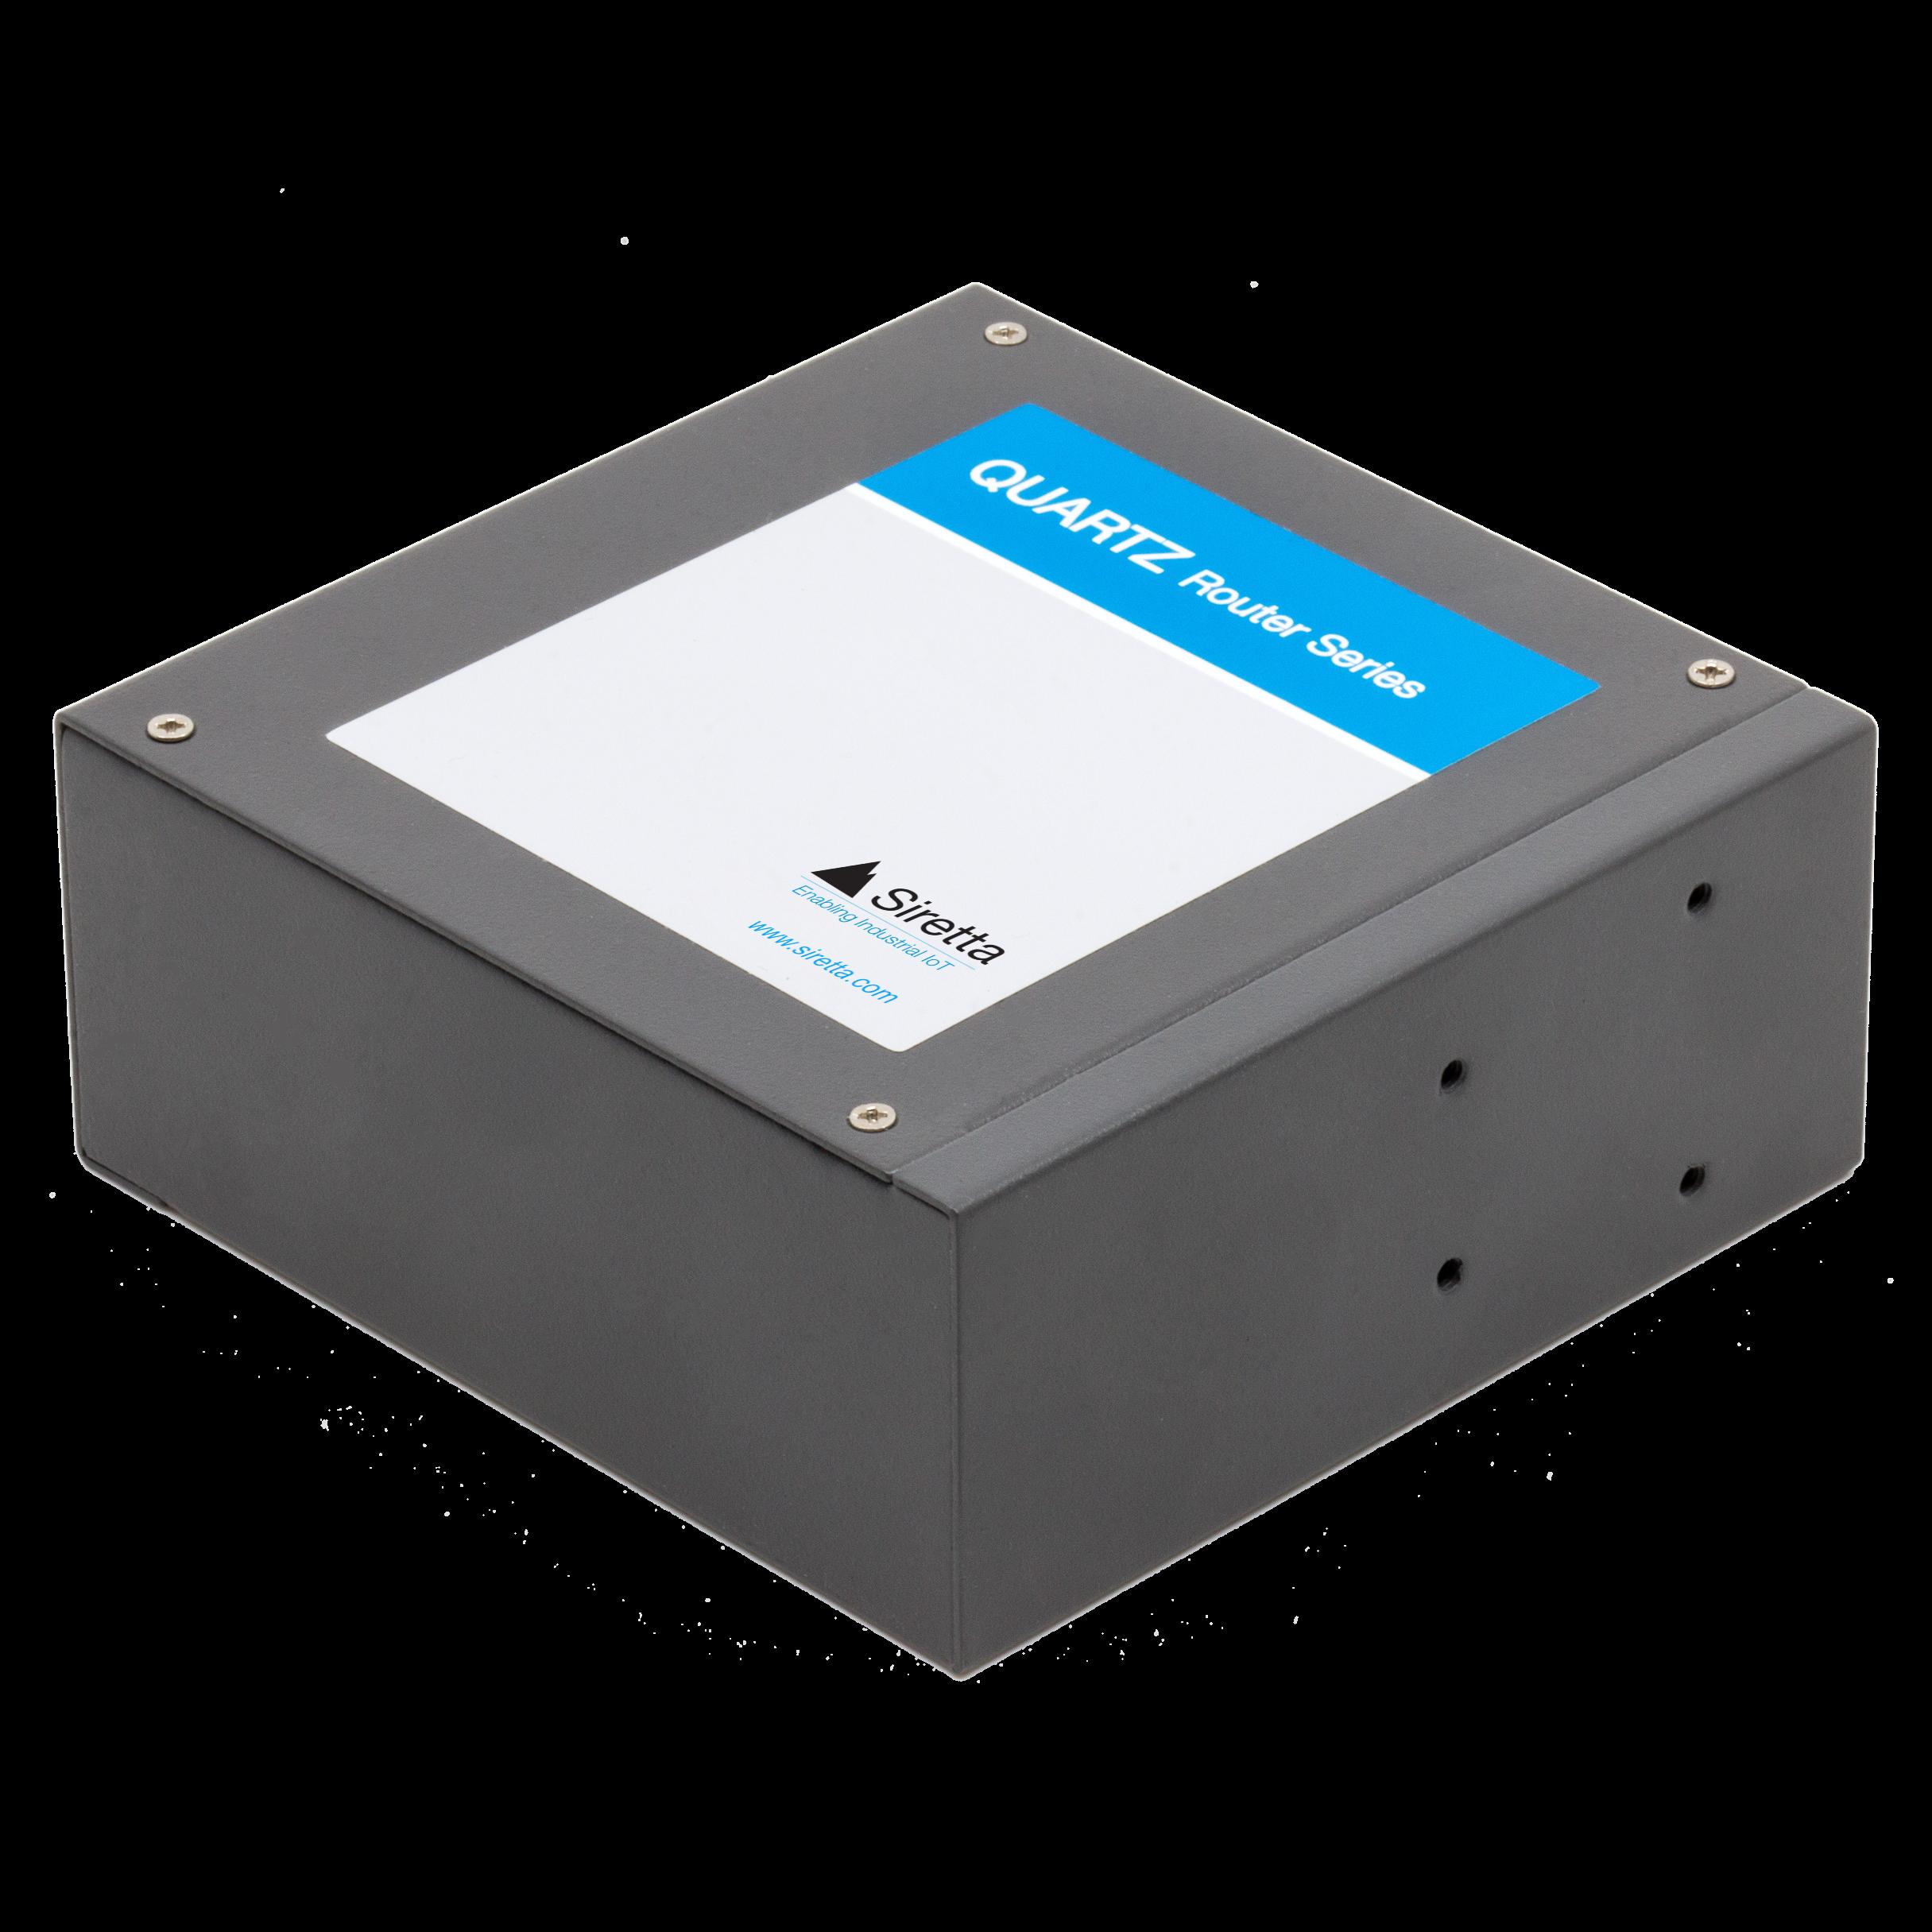 QUARTZ (EU) Dual LAN, Dual SIM, Digital I/O Industrial Router